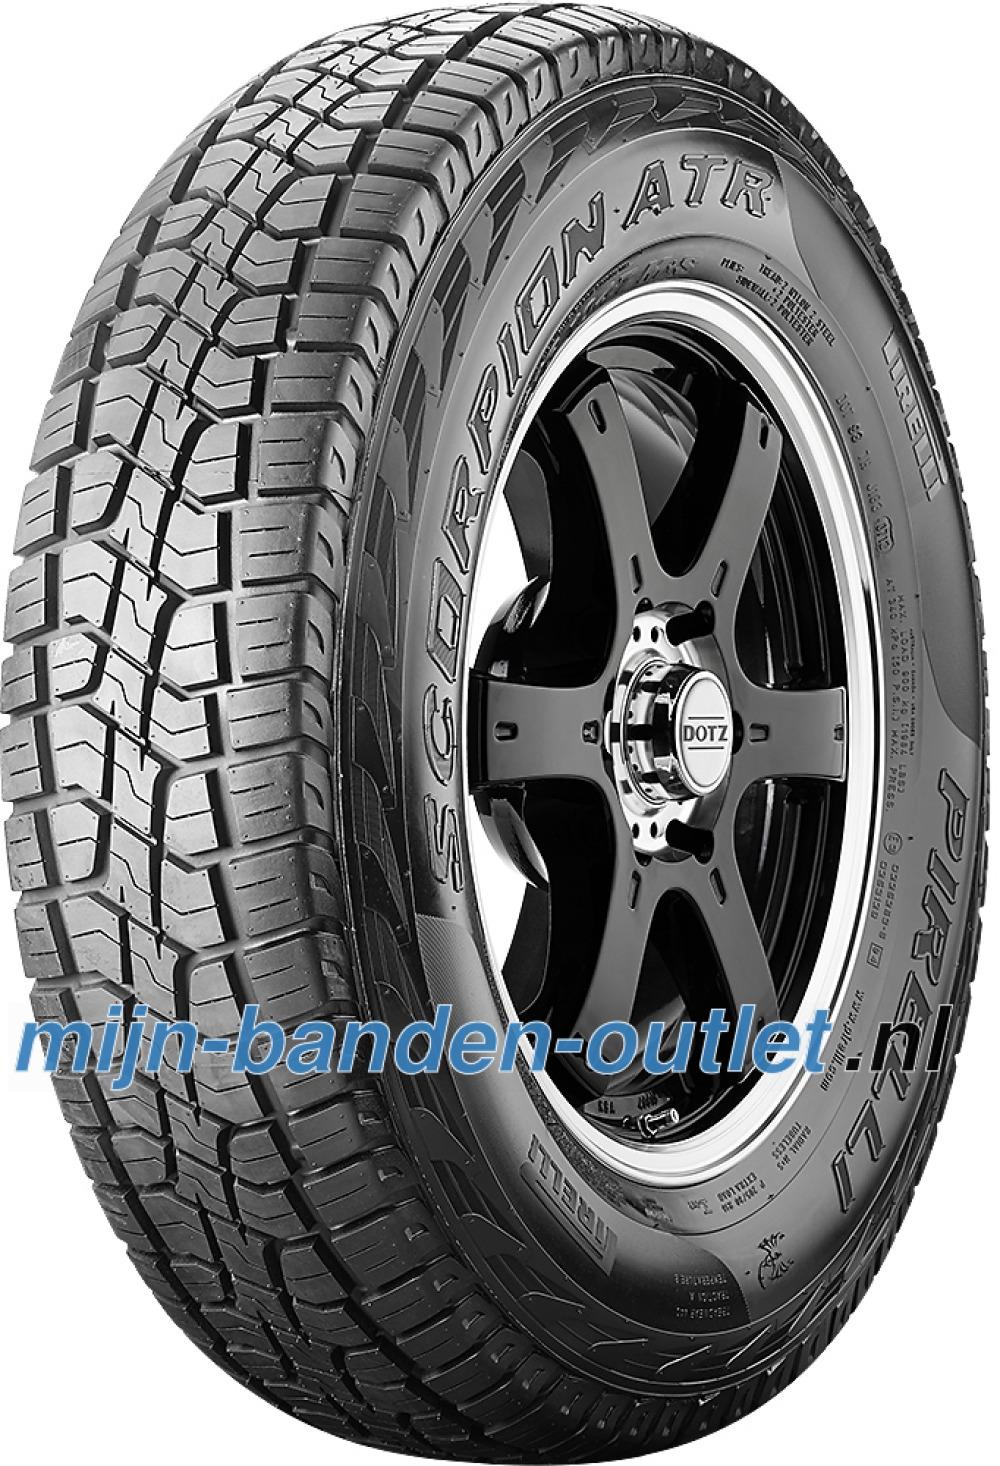 Pirelli Scorpion ATR ( 235/65 R17 108H XL , met velgrandbescherming (MFS) )